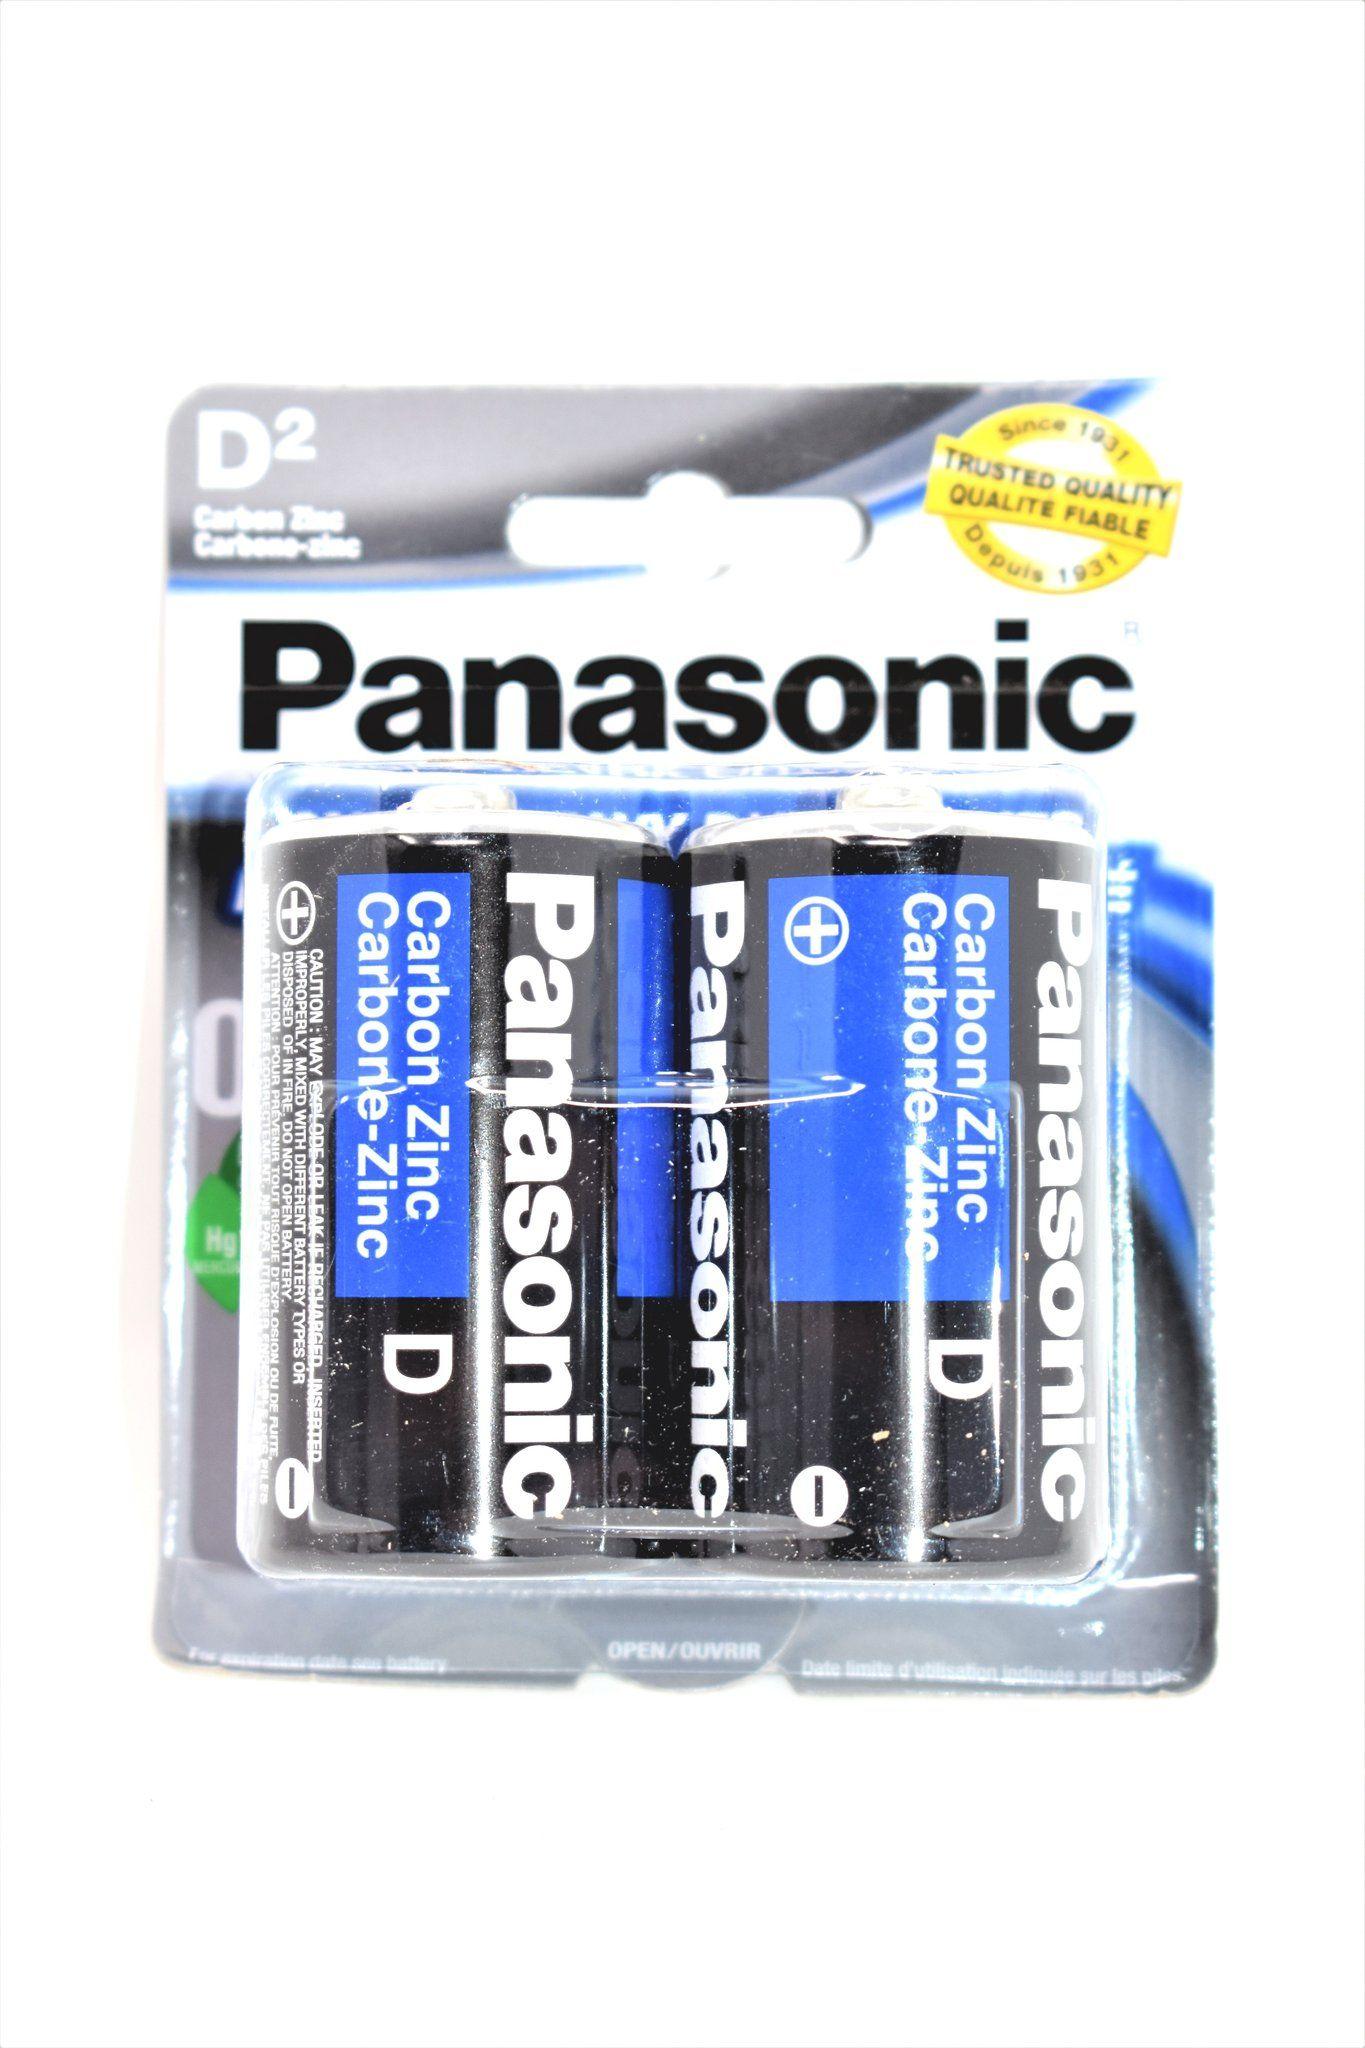 Panasonic D Super Heavy Duty Power Batteries 2 Ct Heavy Duty Panasonic Heavy